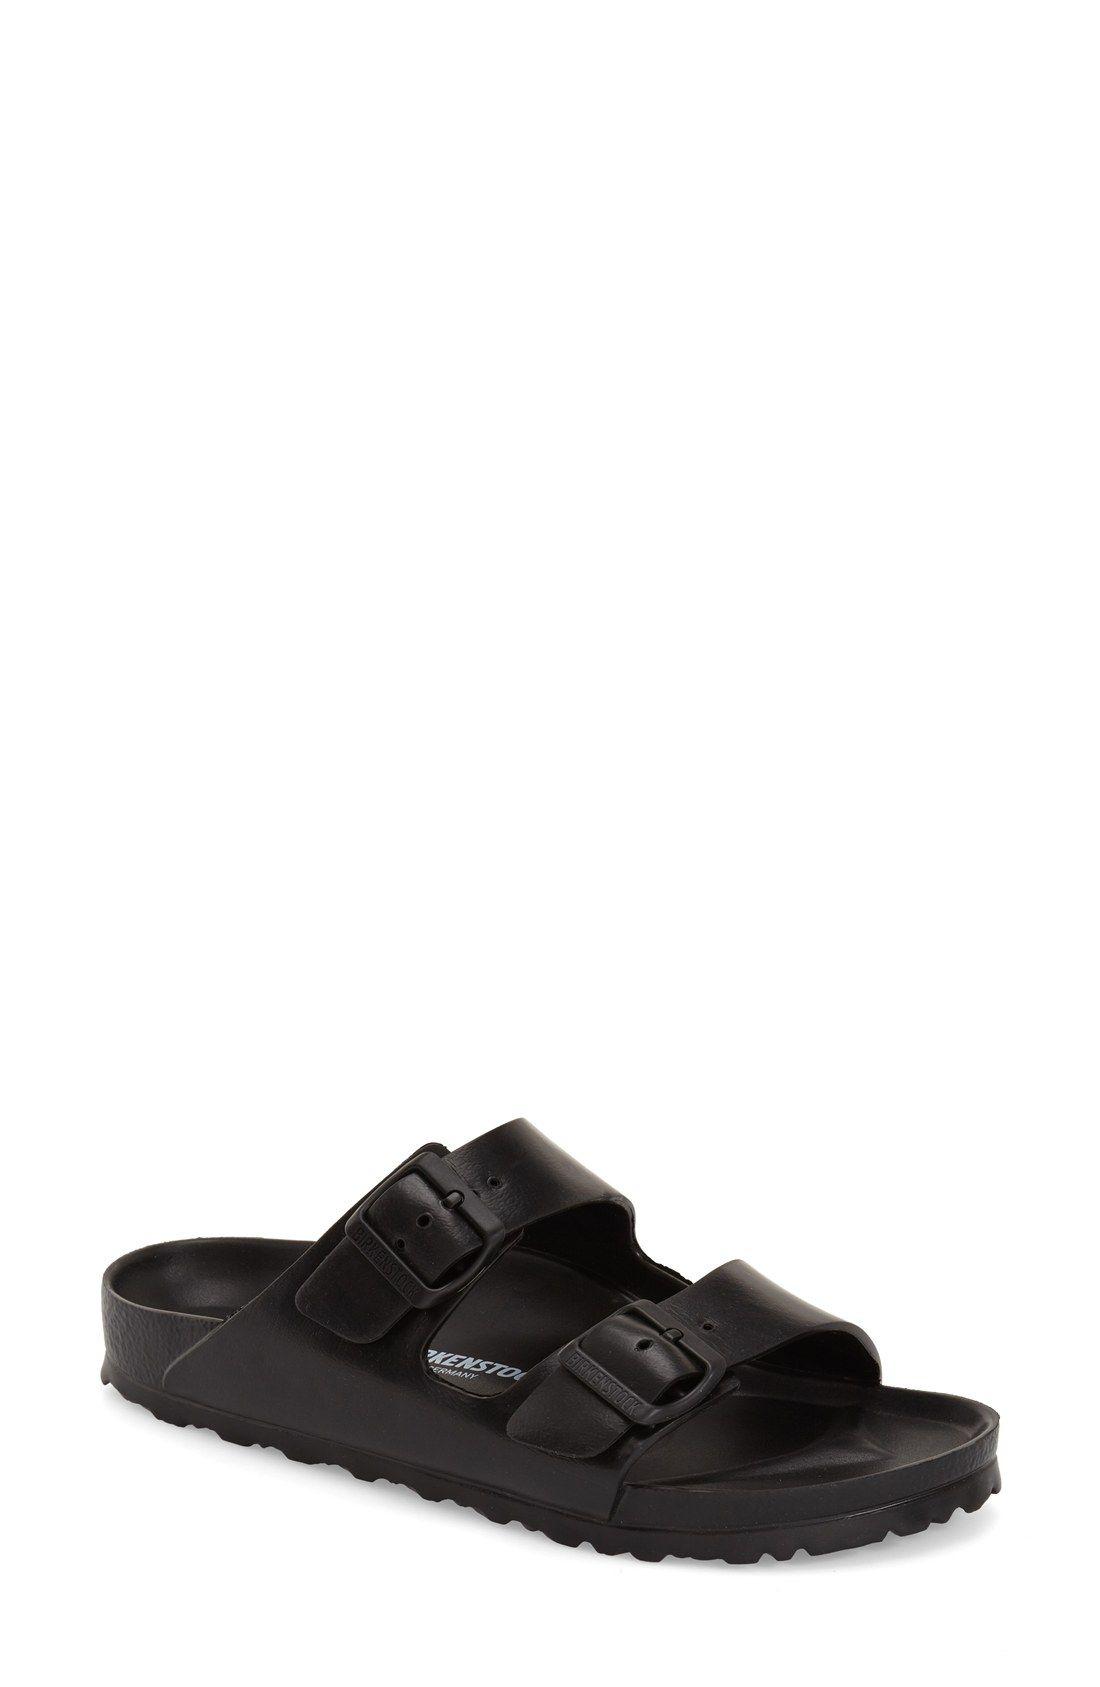 82050ae88a4d Birkenstock  Essentials - Arizona  Slide Sandal (Women) (Nordstrom  Exclusive)